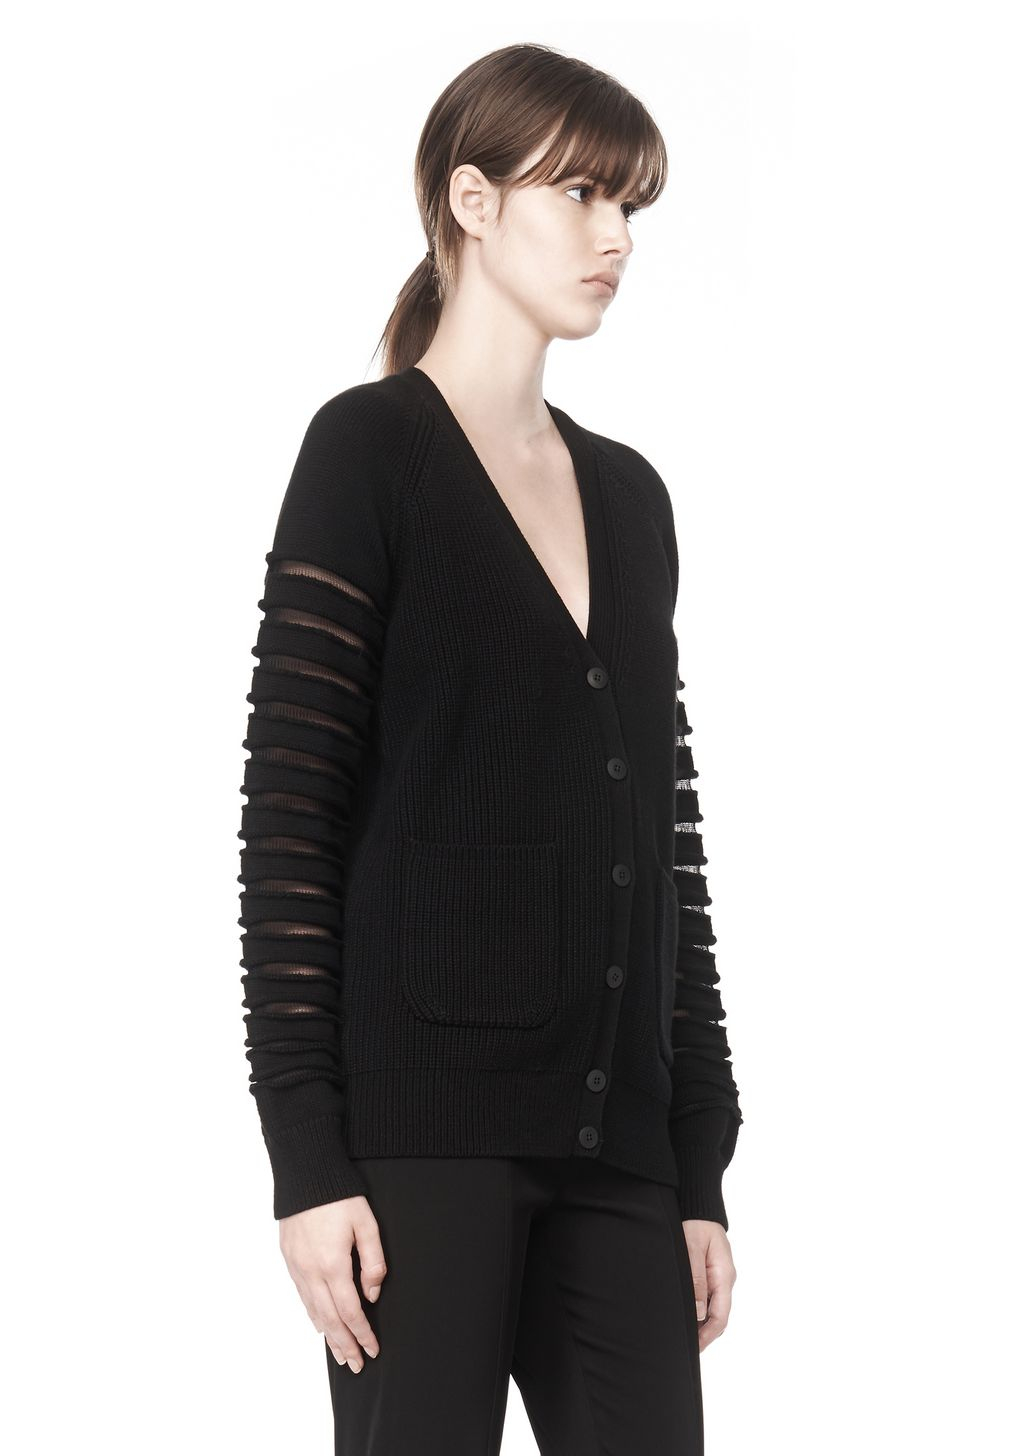 Alexander wang Cardigan With Sheer Striped Sleeves in Black | Lyst